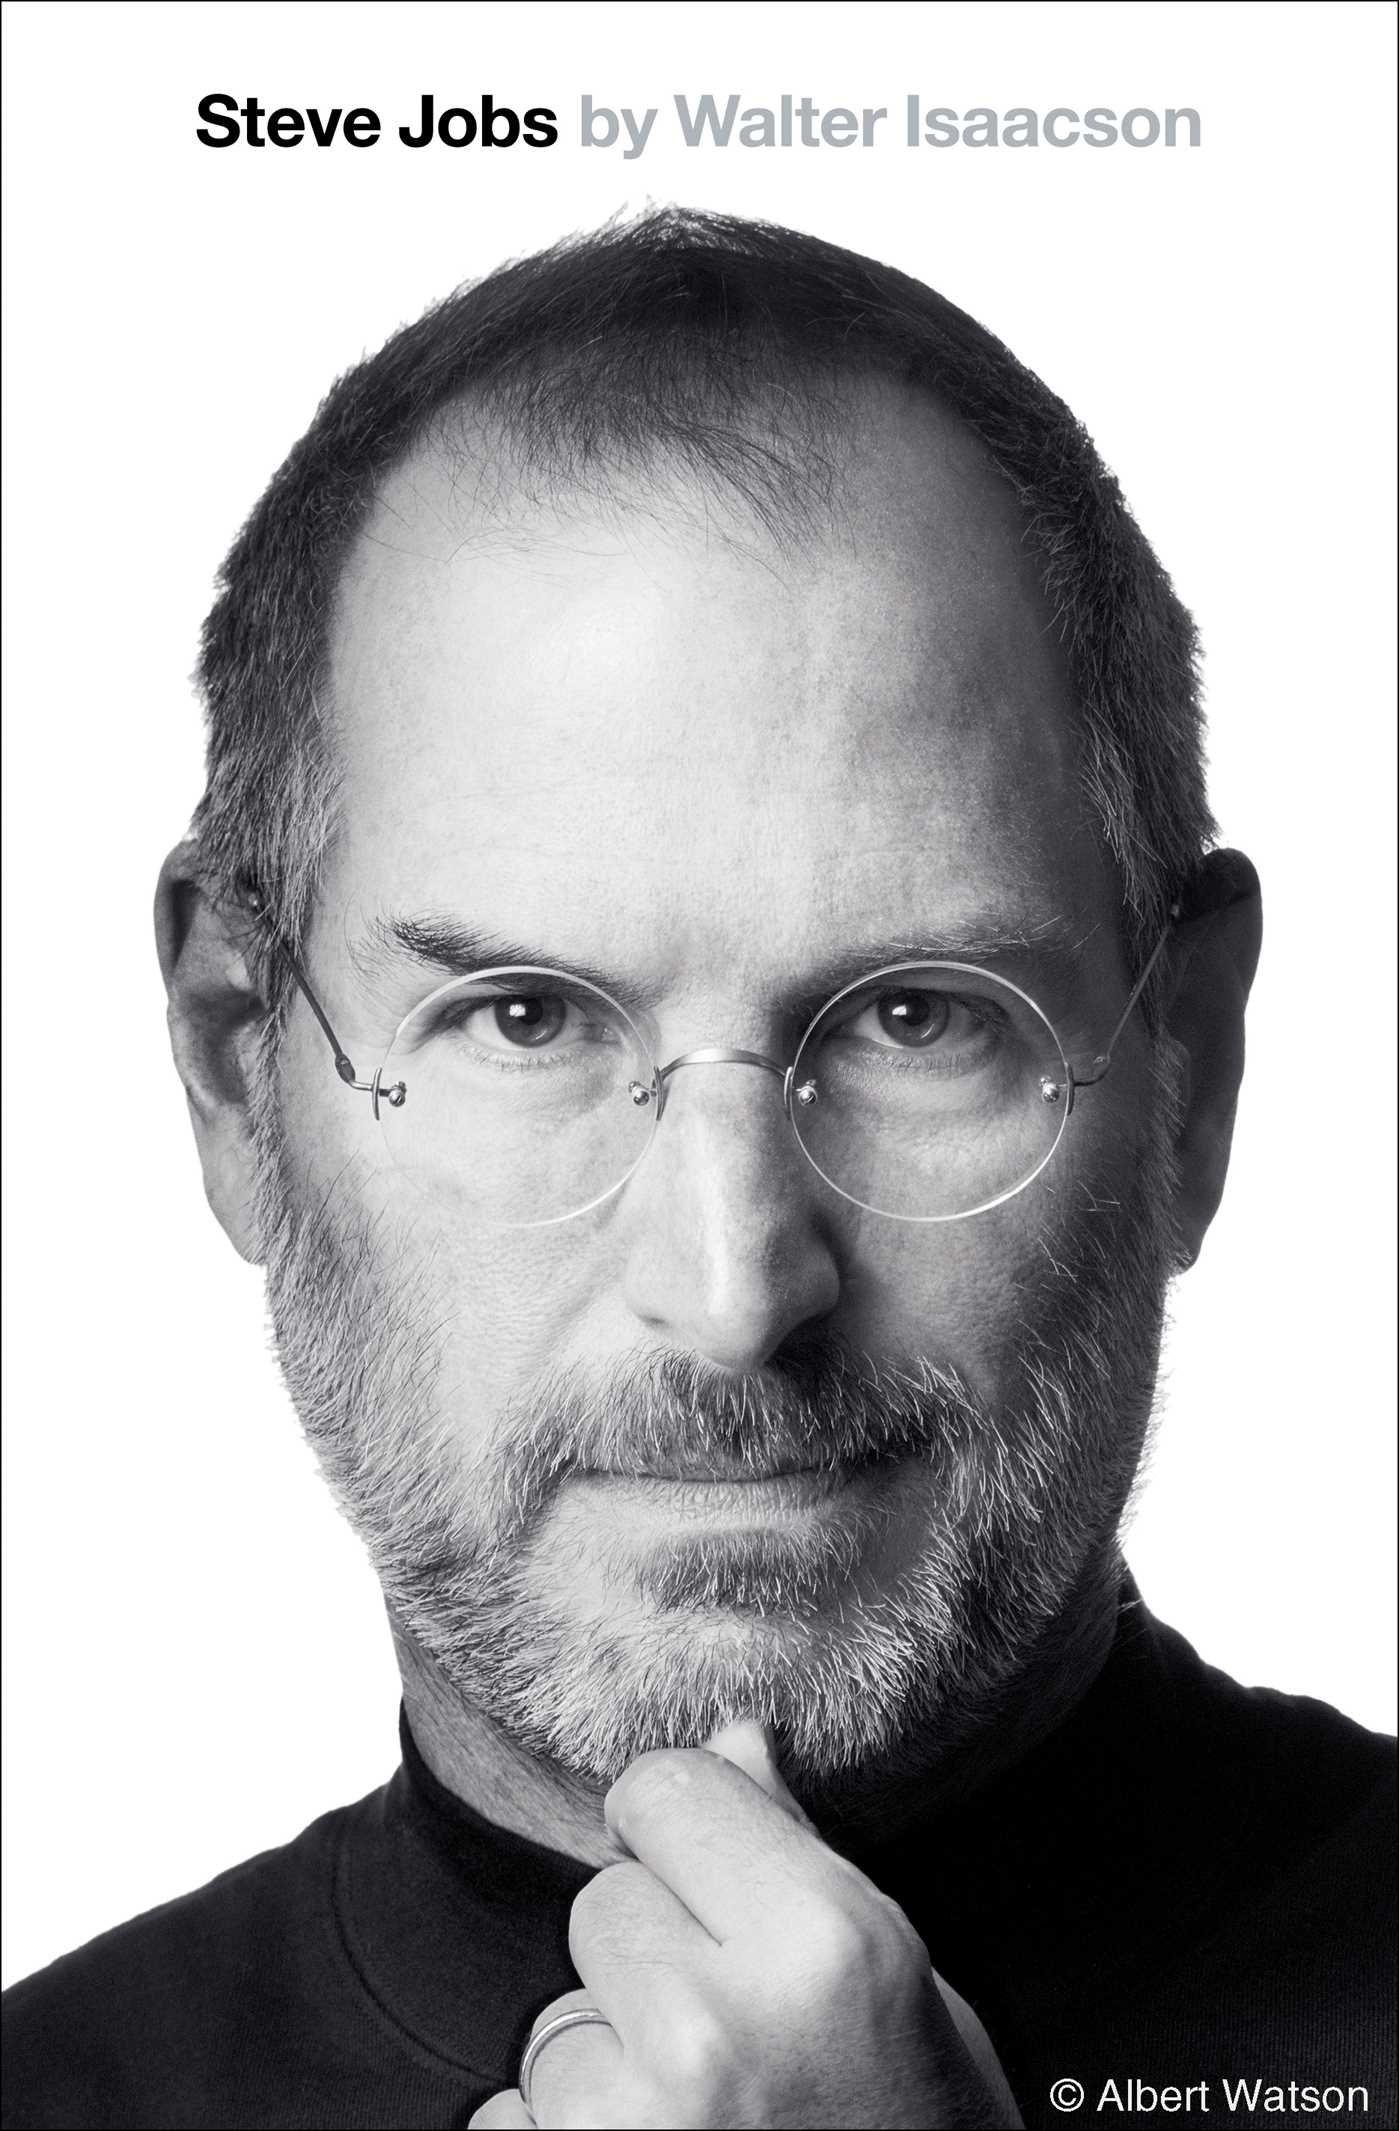 Steve Jobs ecximagesamazoncomimagesI81VStYnDGrLjpg